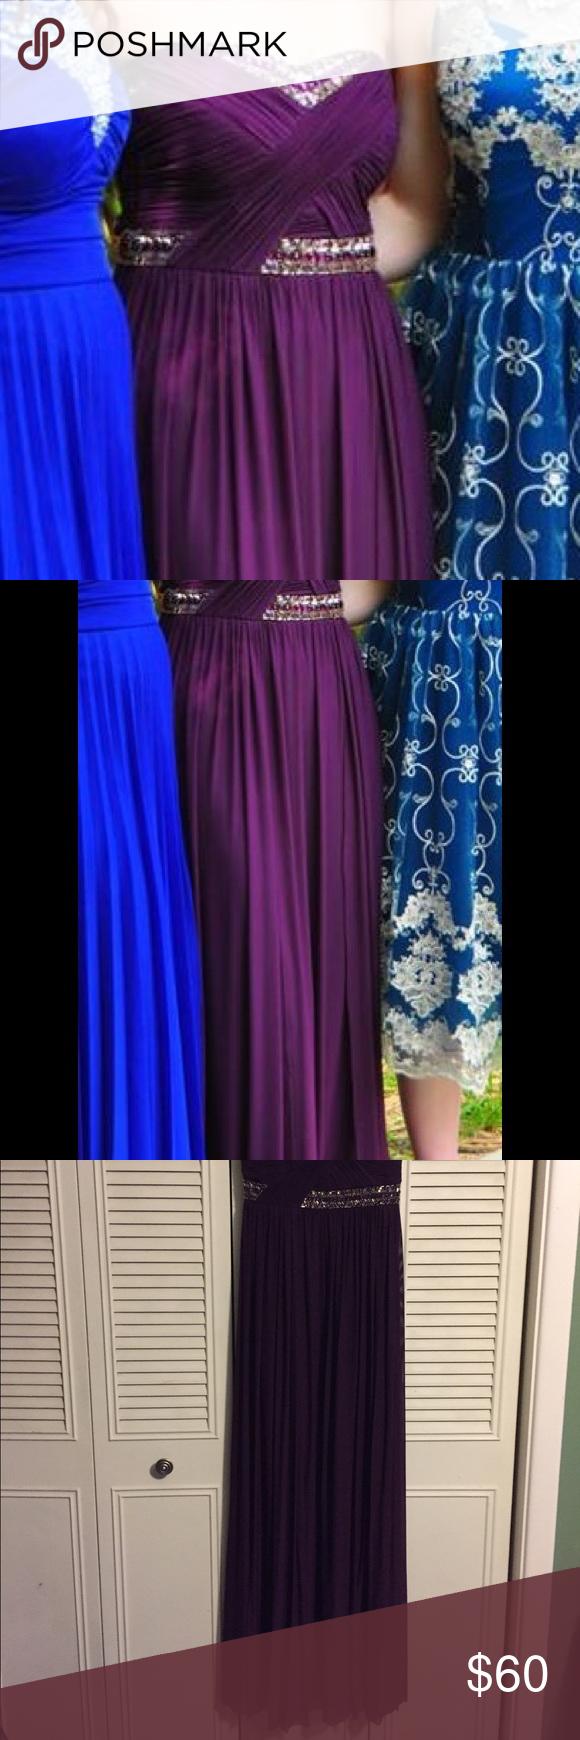 Purple strapless prom dress strapless prom dresses prom and